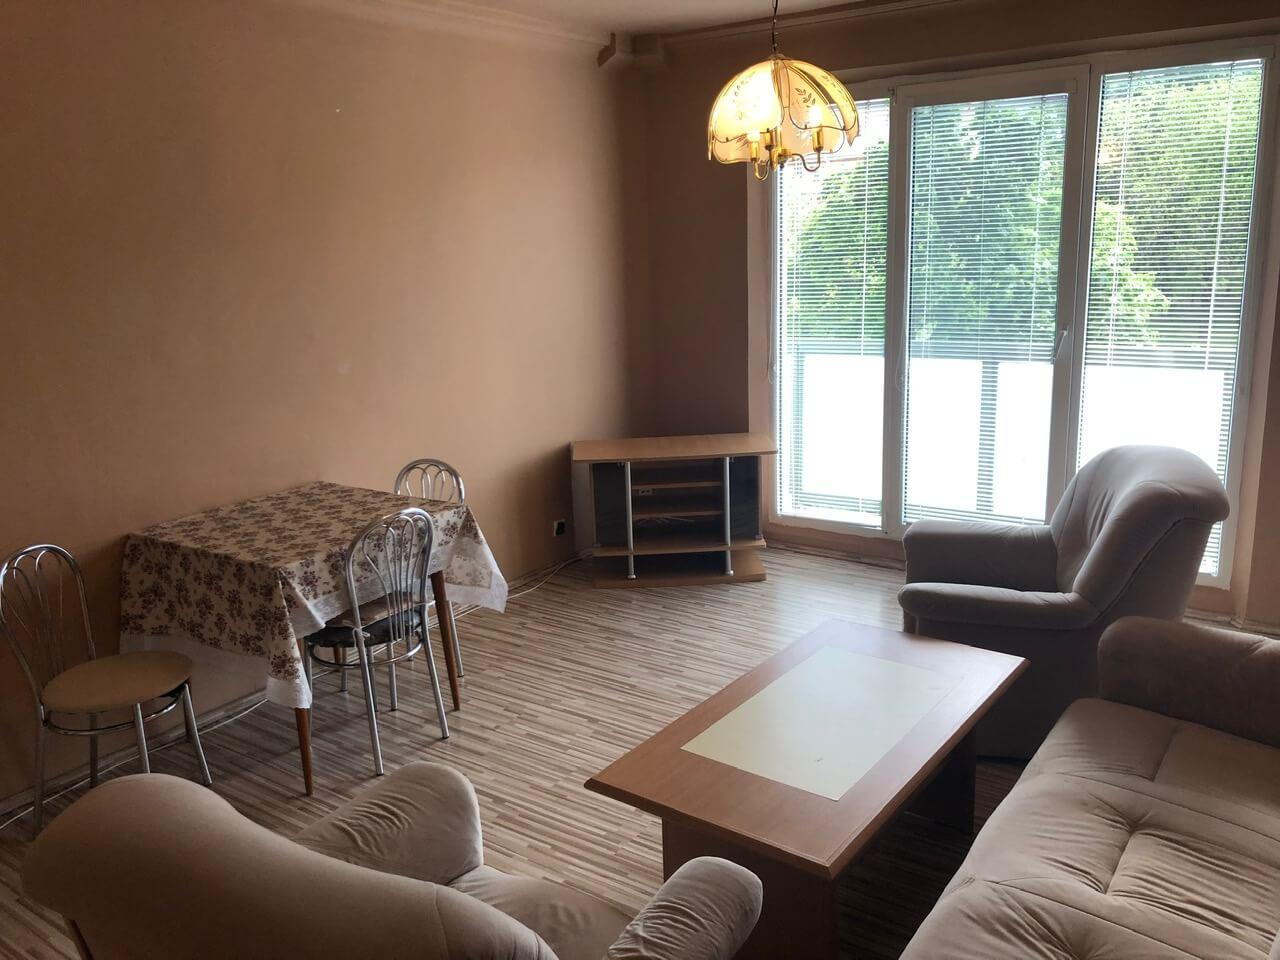 3 izbový byt, Račianska 85, 63m2, balkon 10m2, výborná lokalita-2